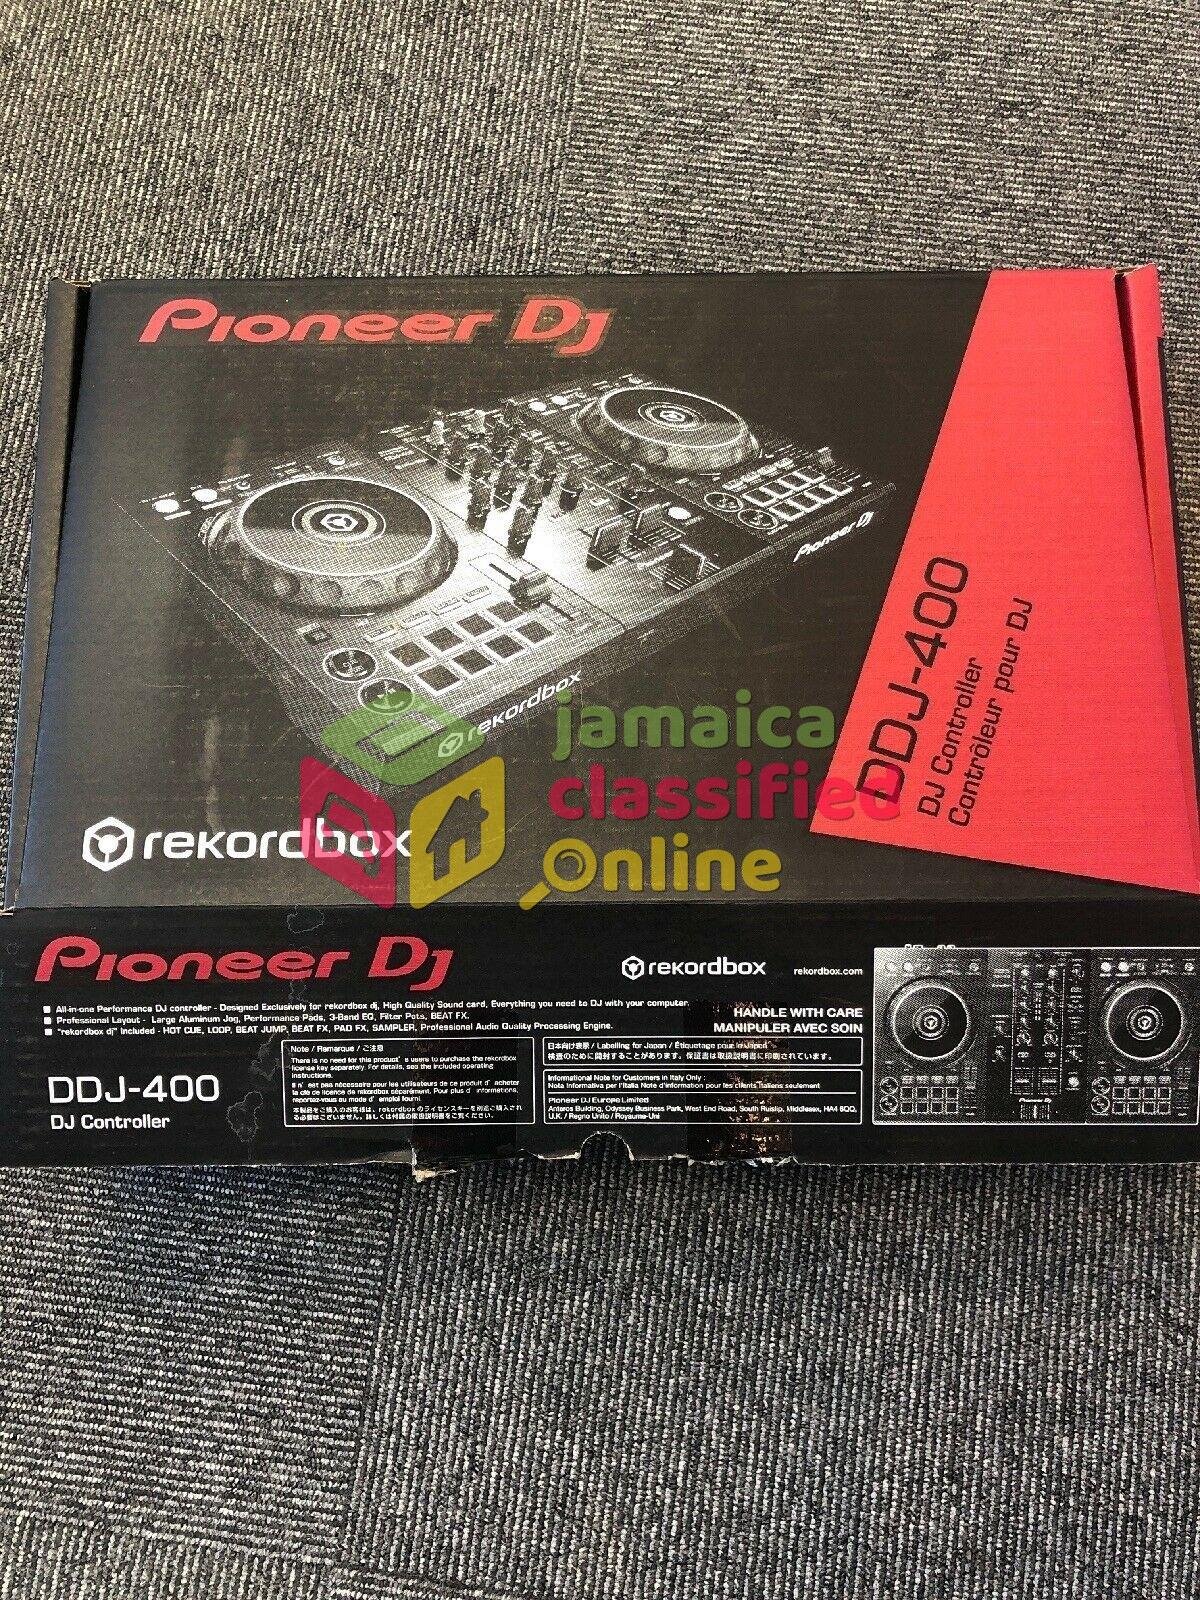 Pioneer DDJ-400 2-Channel Rekordbox DJ Controller for sale